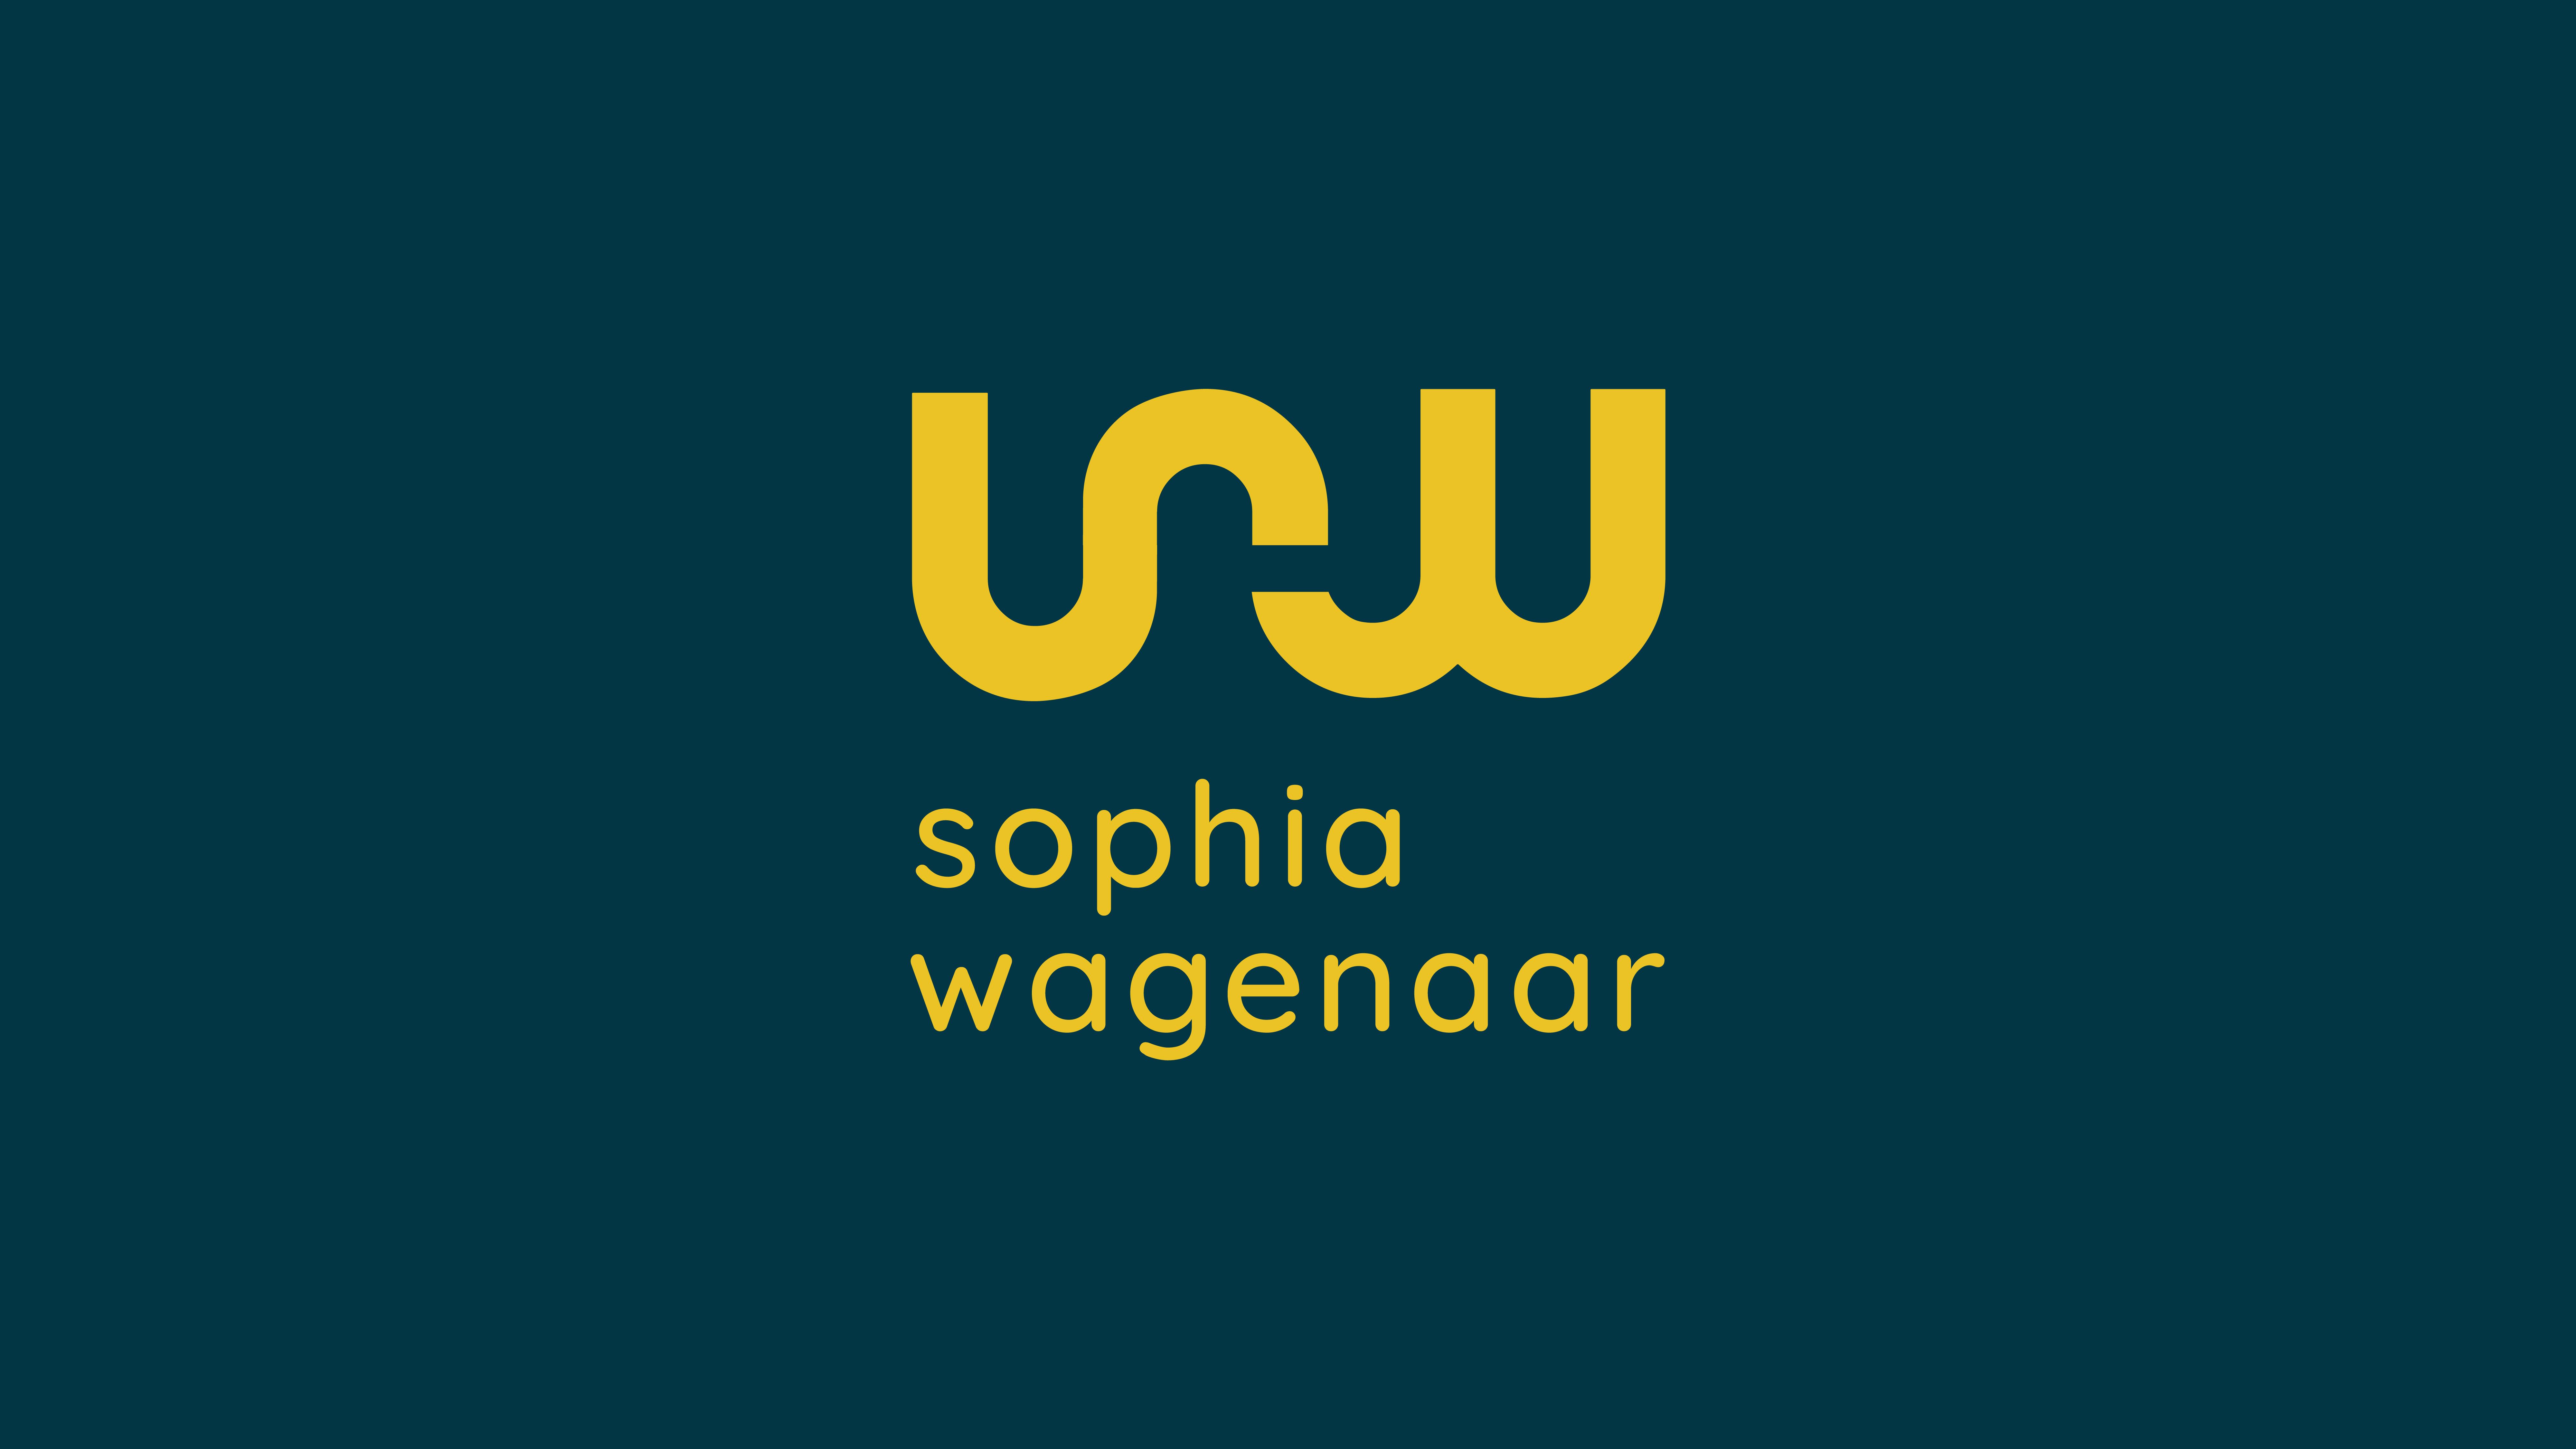 Sophia-Wagenaar-visual-identity-Studio-sont-01